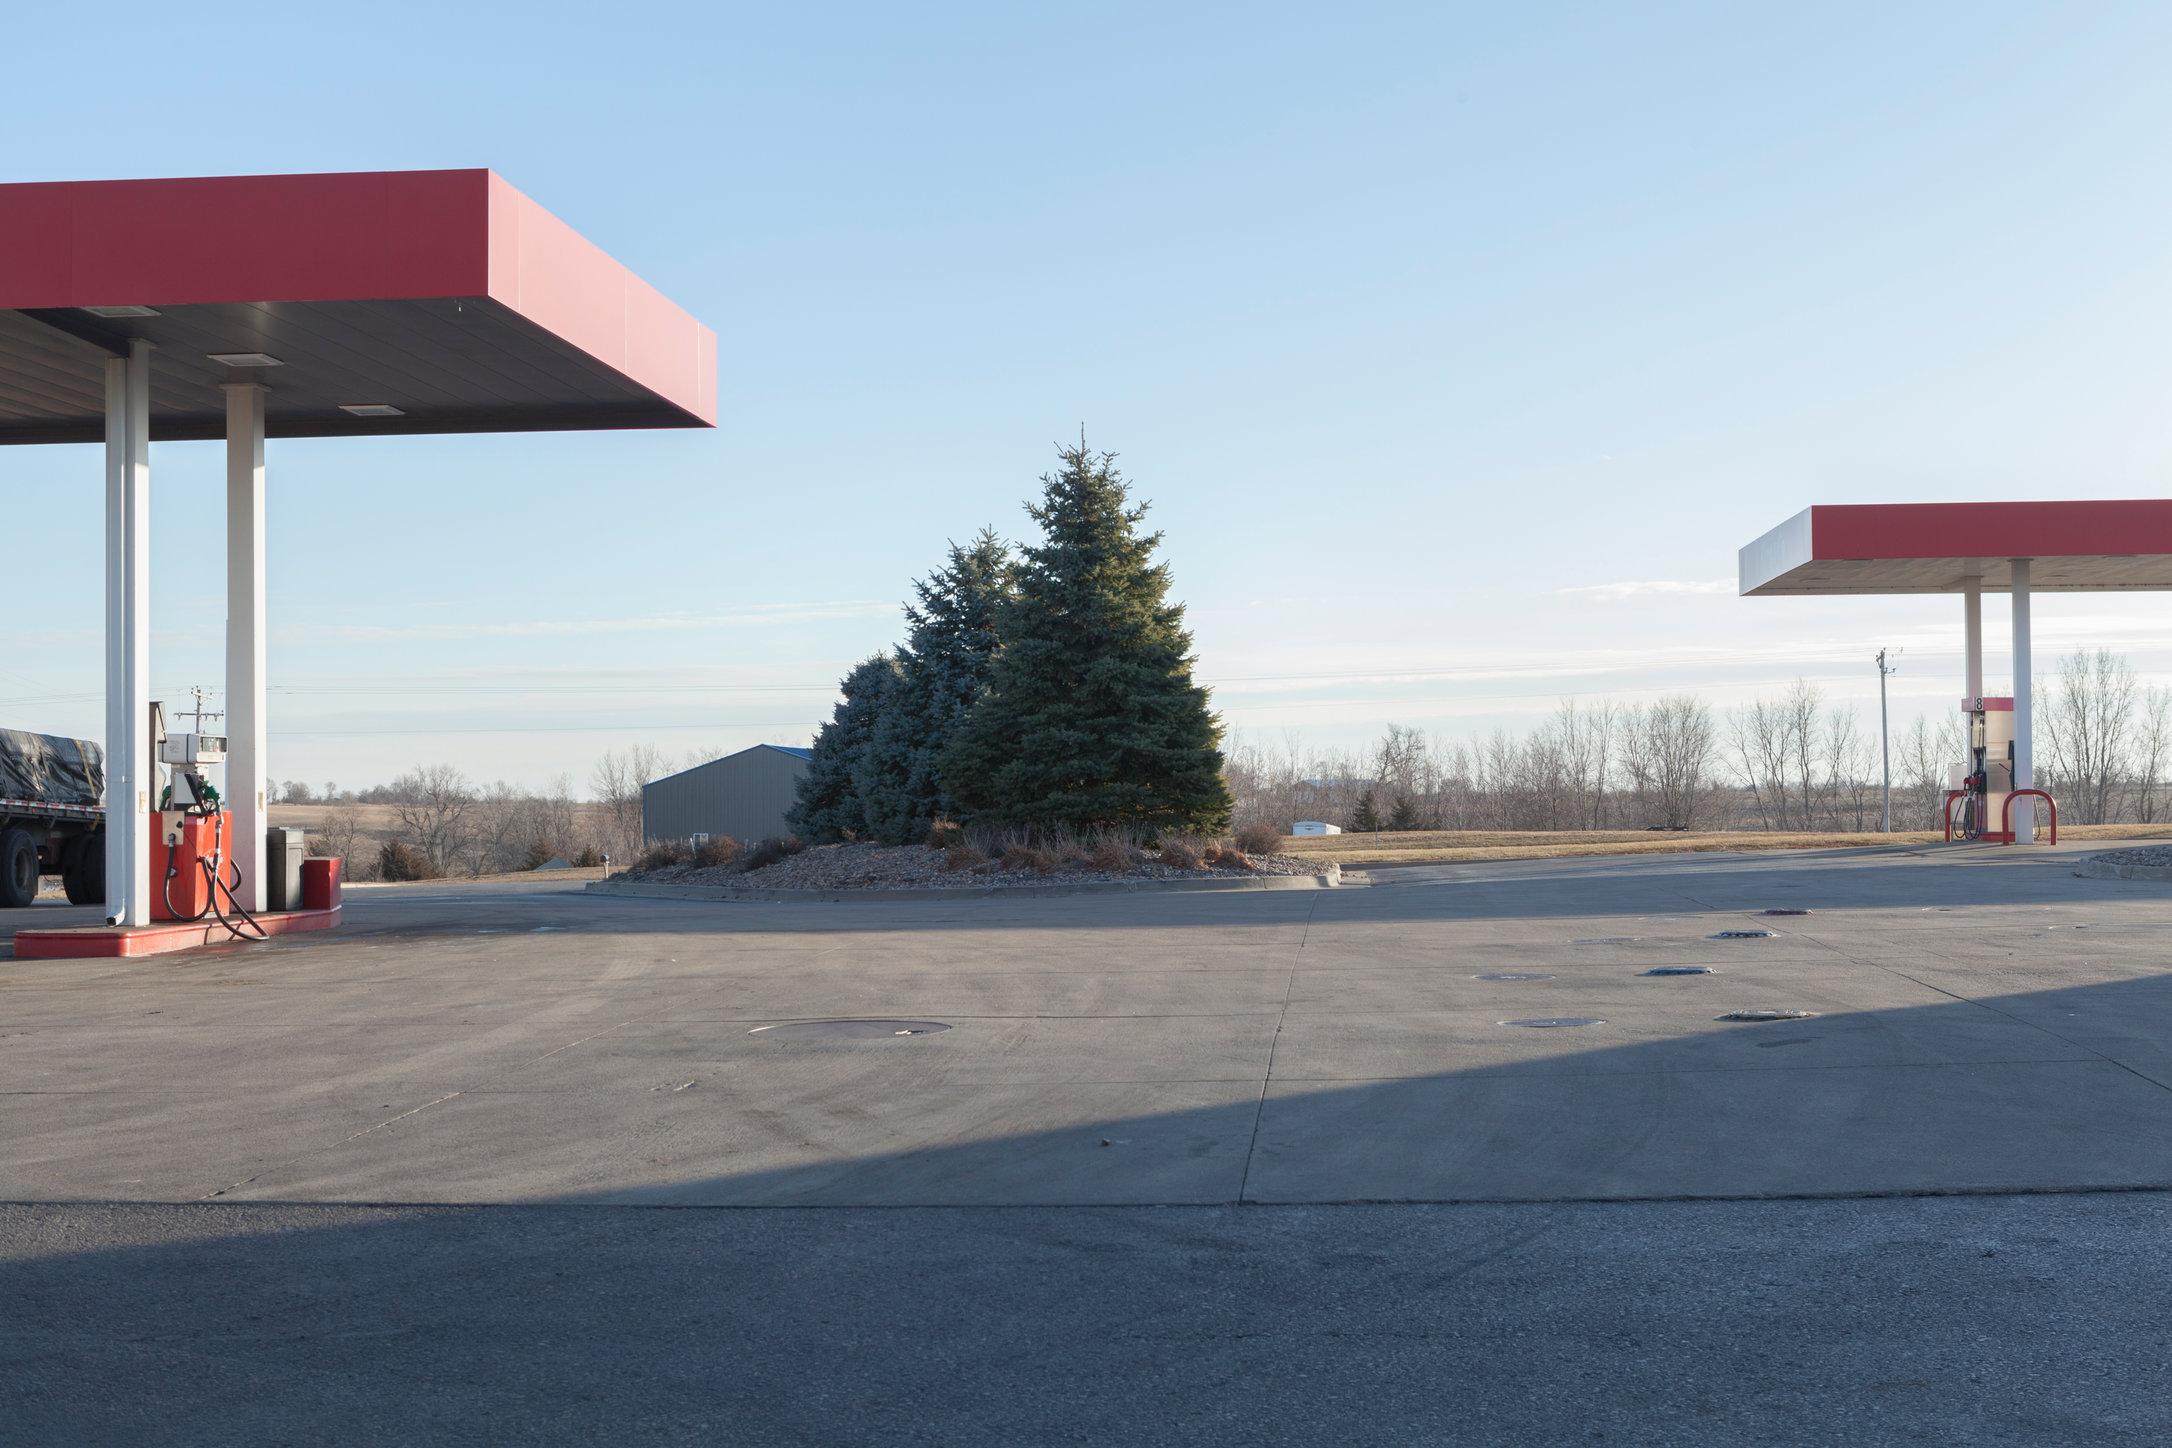 Along I-35, Iowa